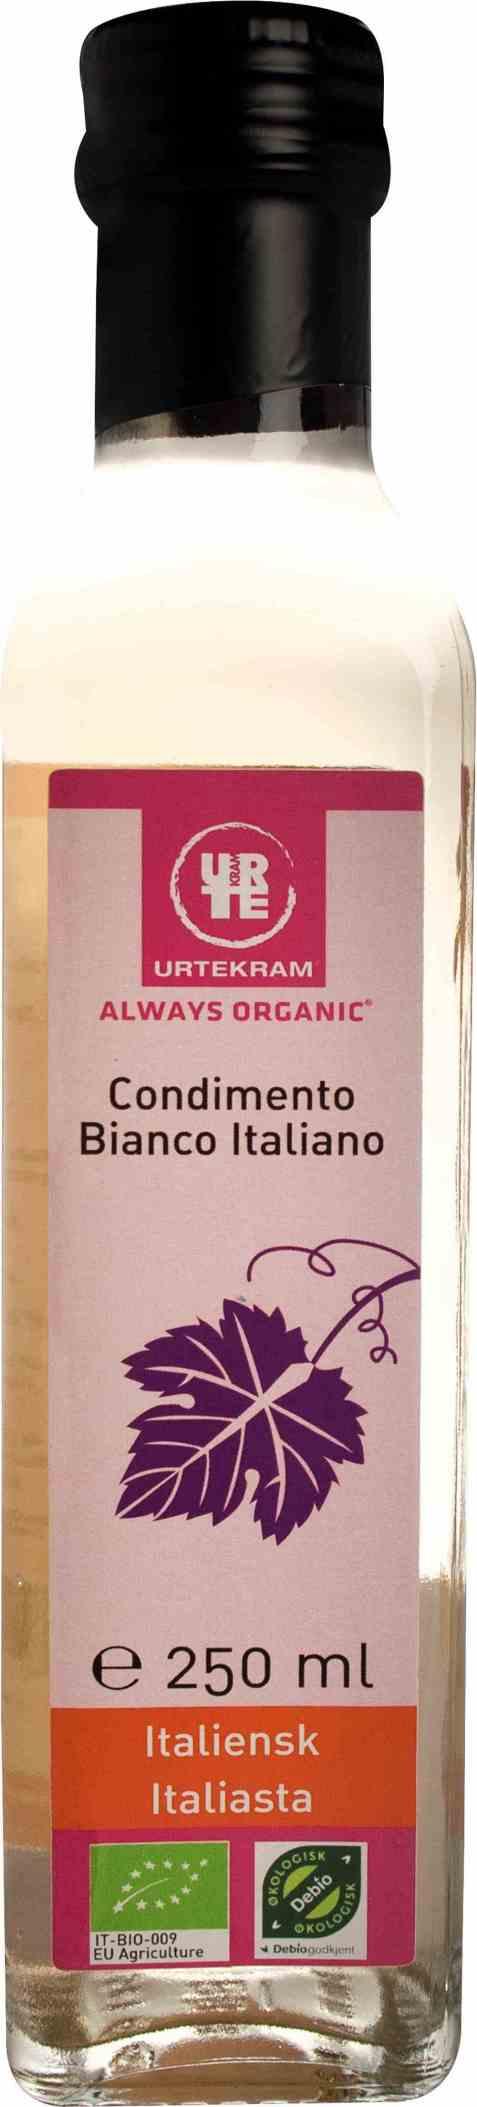 Bilde av Urtekram condimento bianco italiano 250 ml.